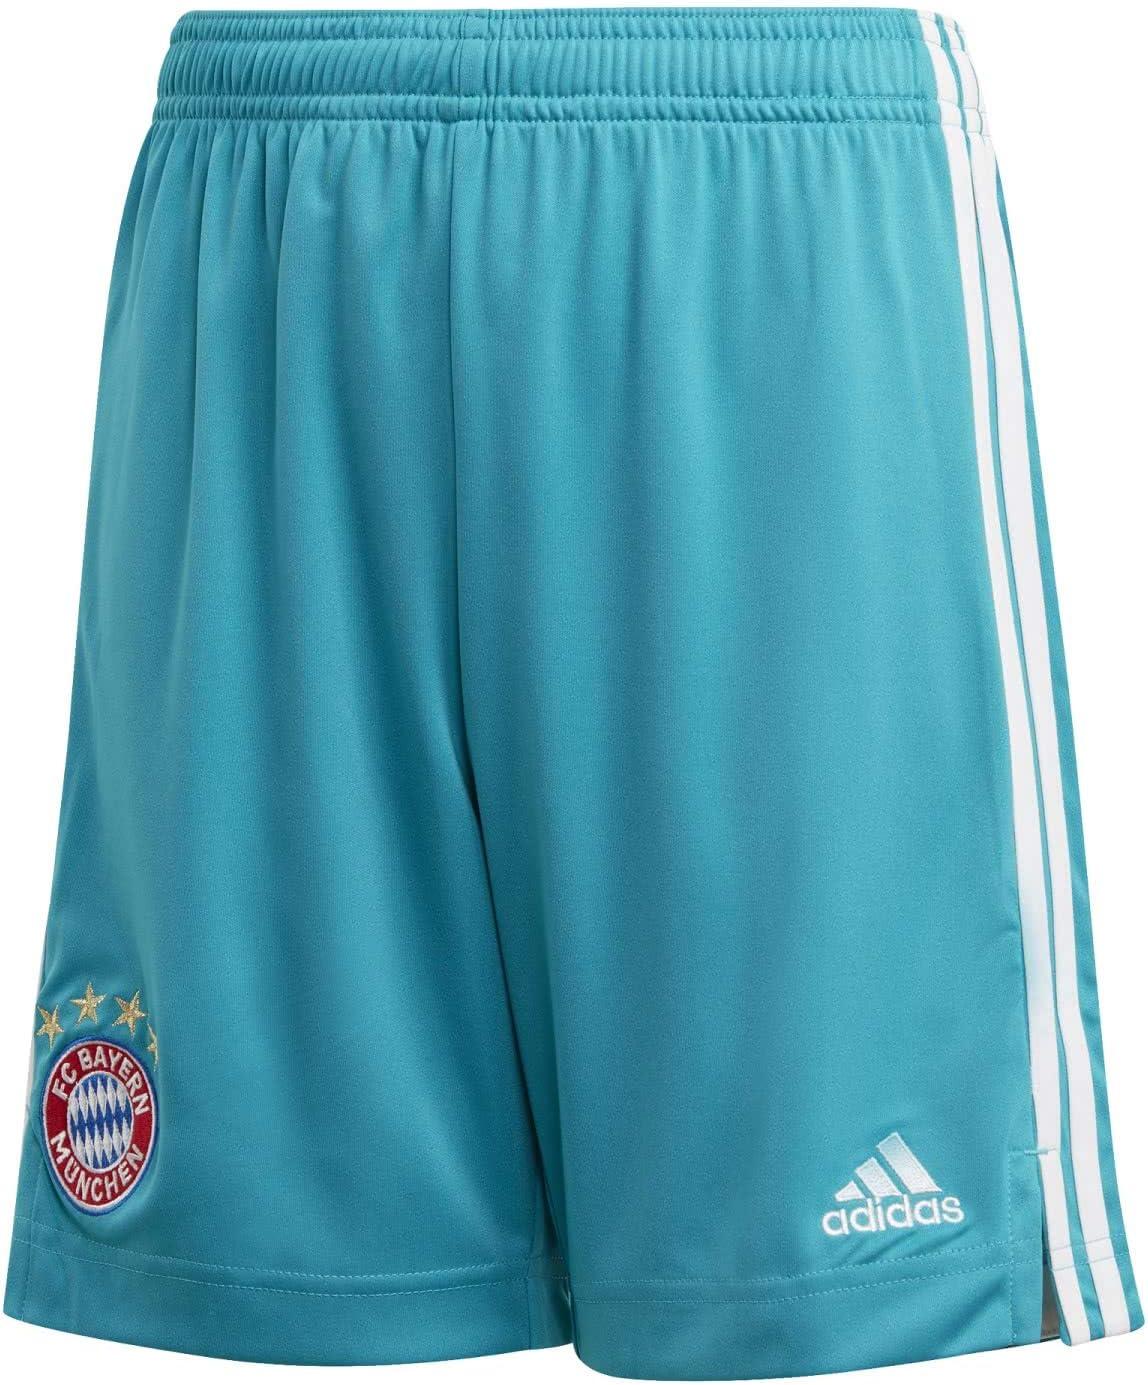 adidas 2020-2021 Bayern Munich Home Goalkeeper Shorts (Green)